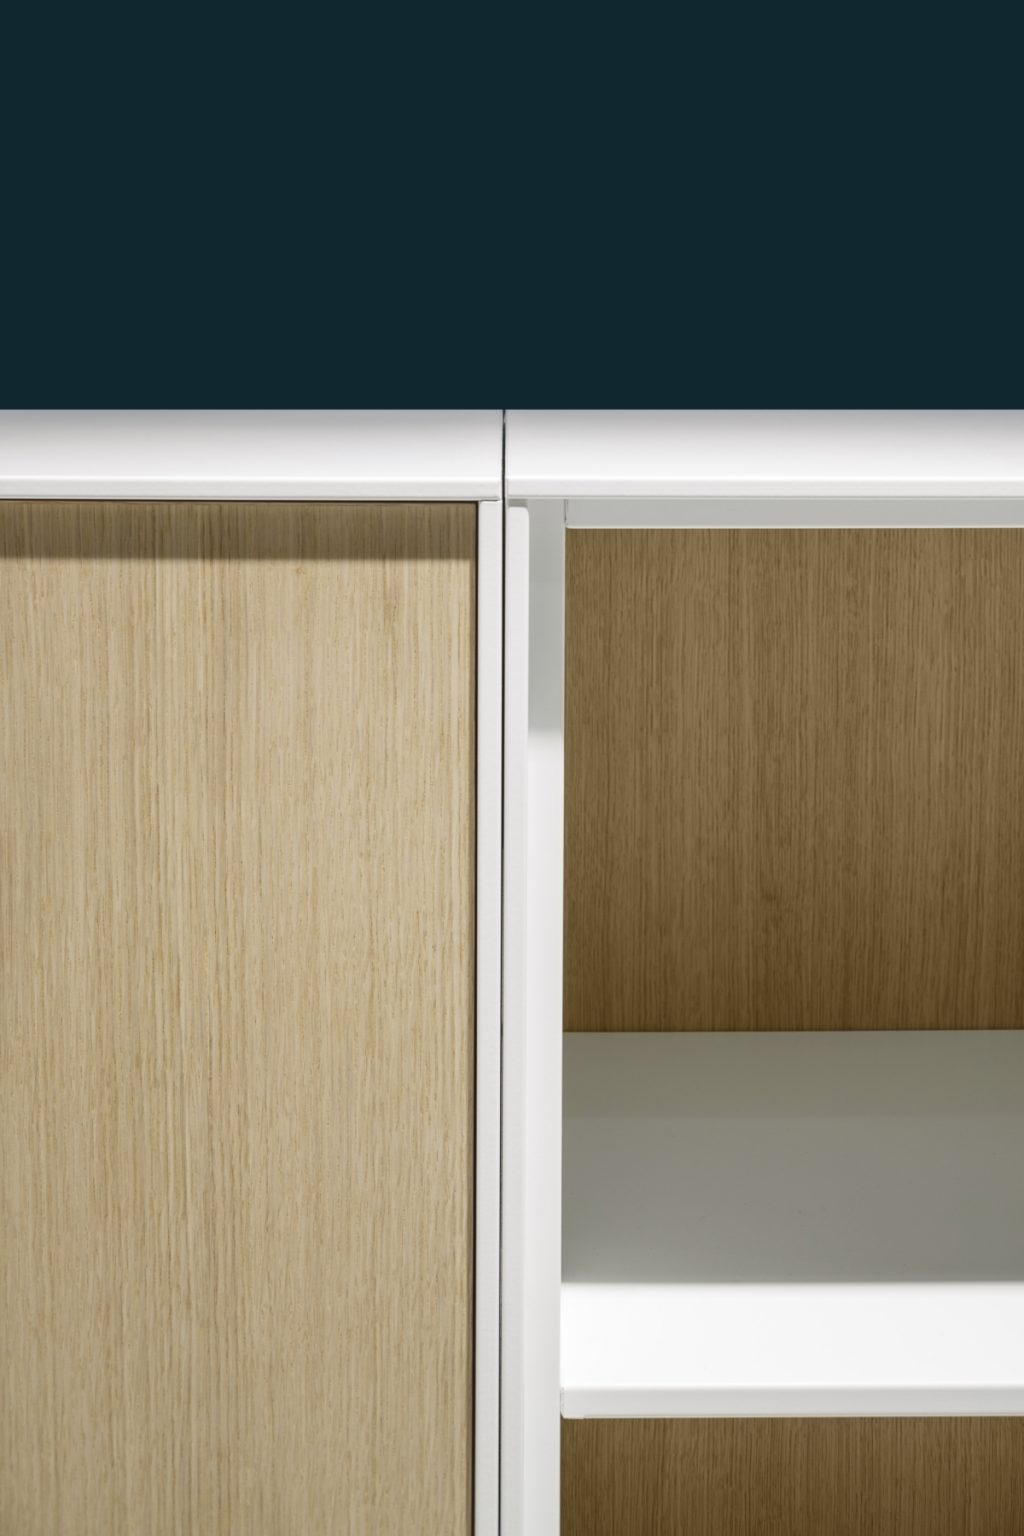 Containerelemente hinzufügen rota s Design Esco